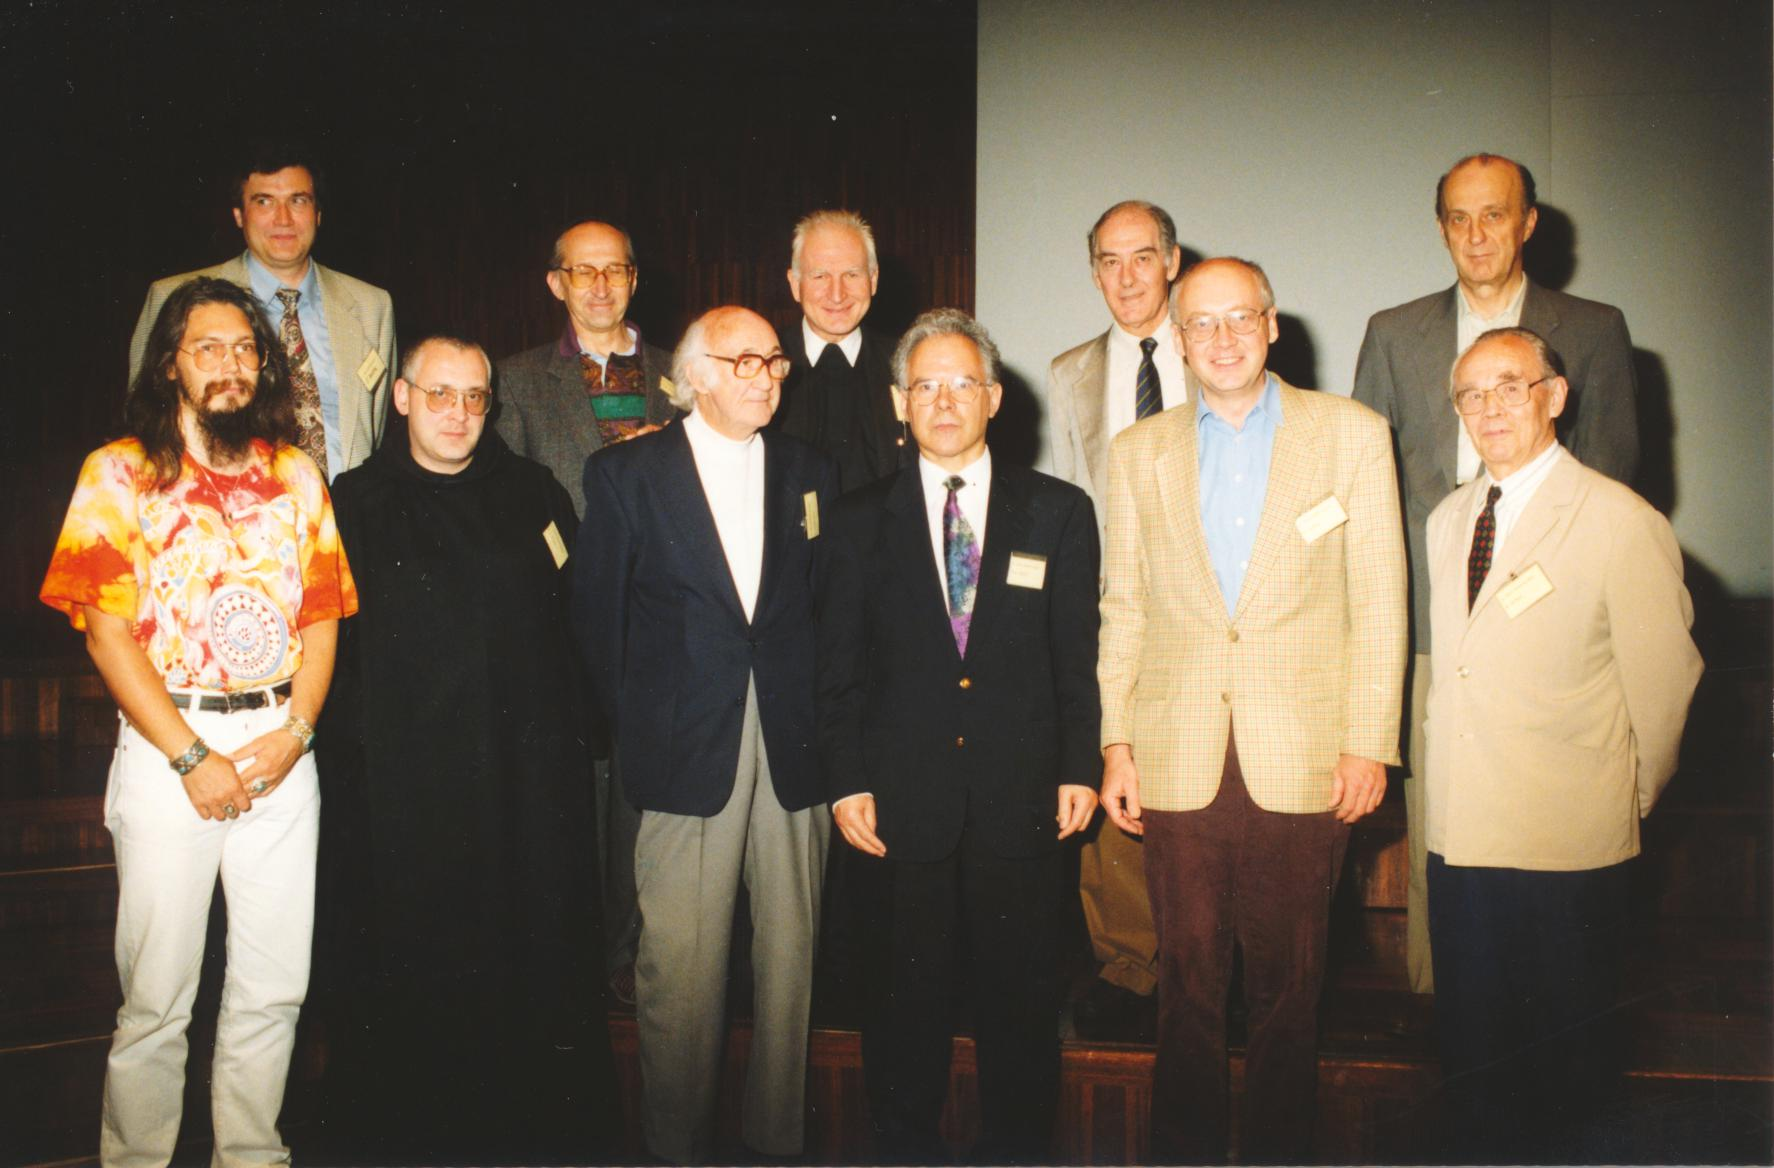 XV. Imago Mundi-Kongress 1995, Innsbruck, Referentenfoto